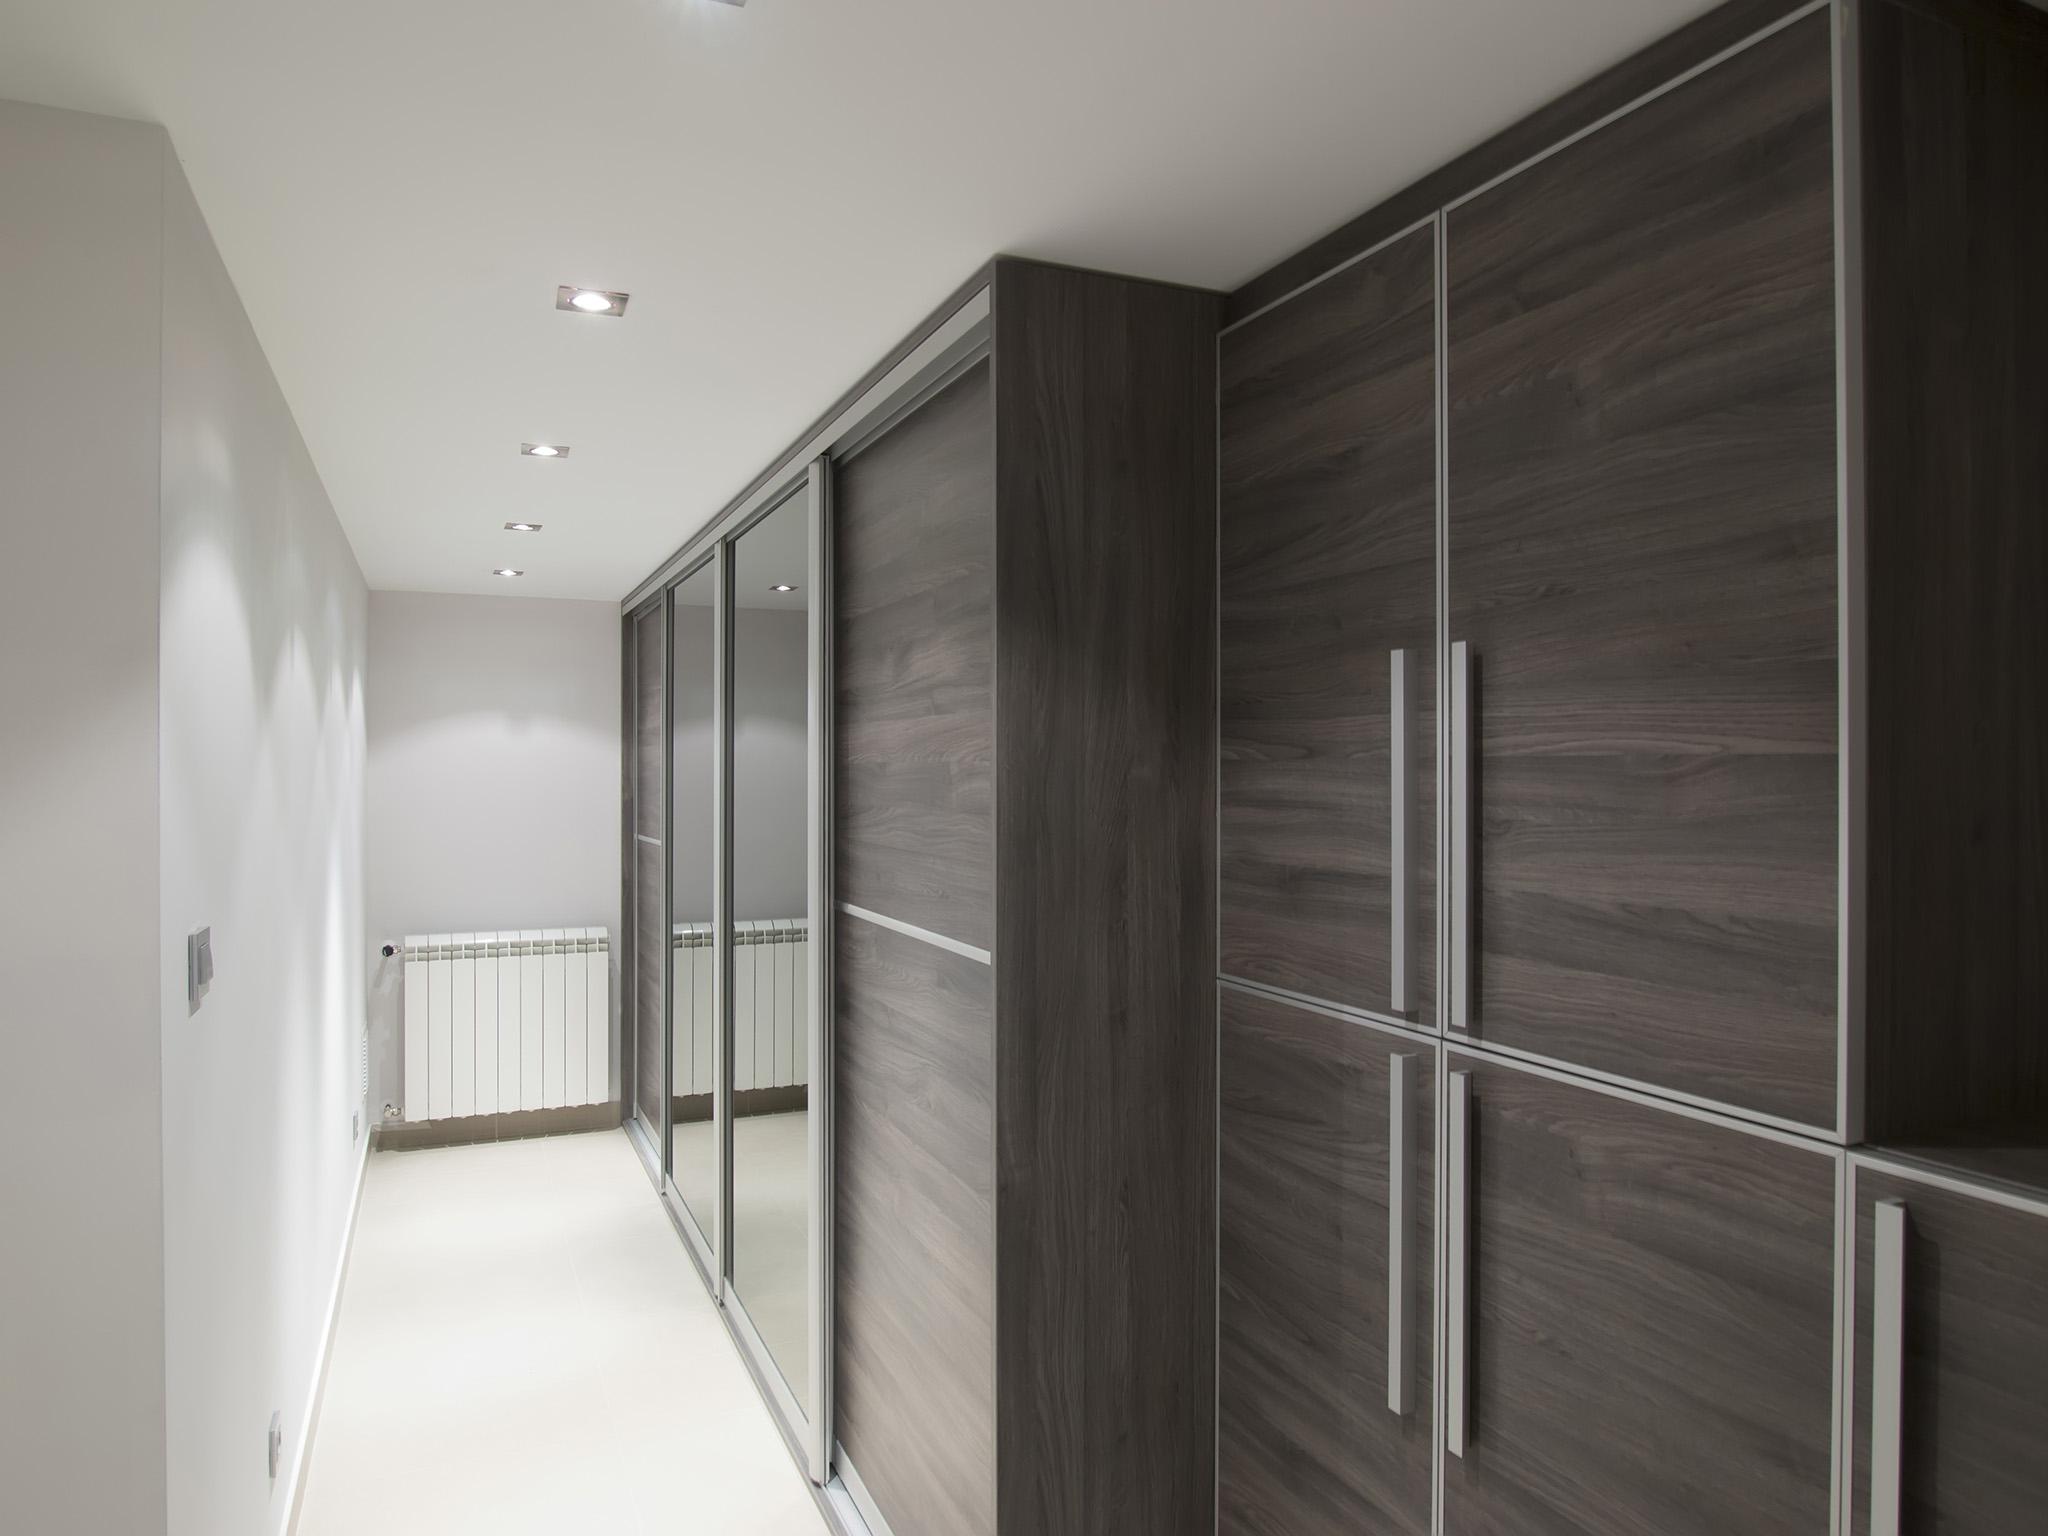 grey wardrobes, sliding wardrobes, modern wardrobes,